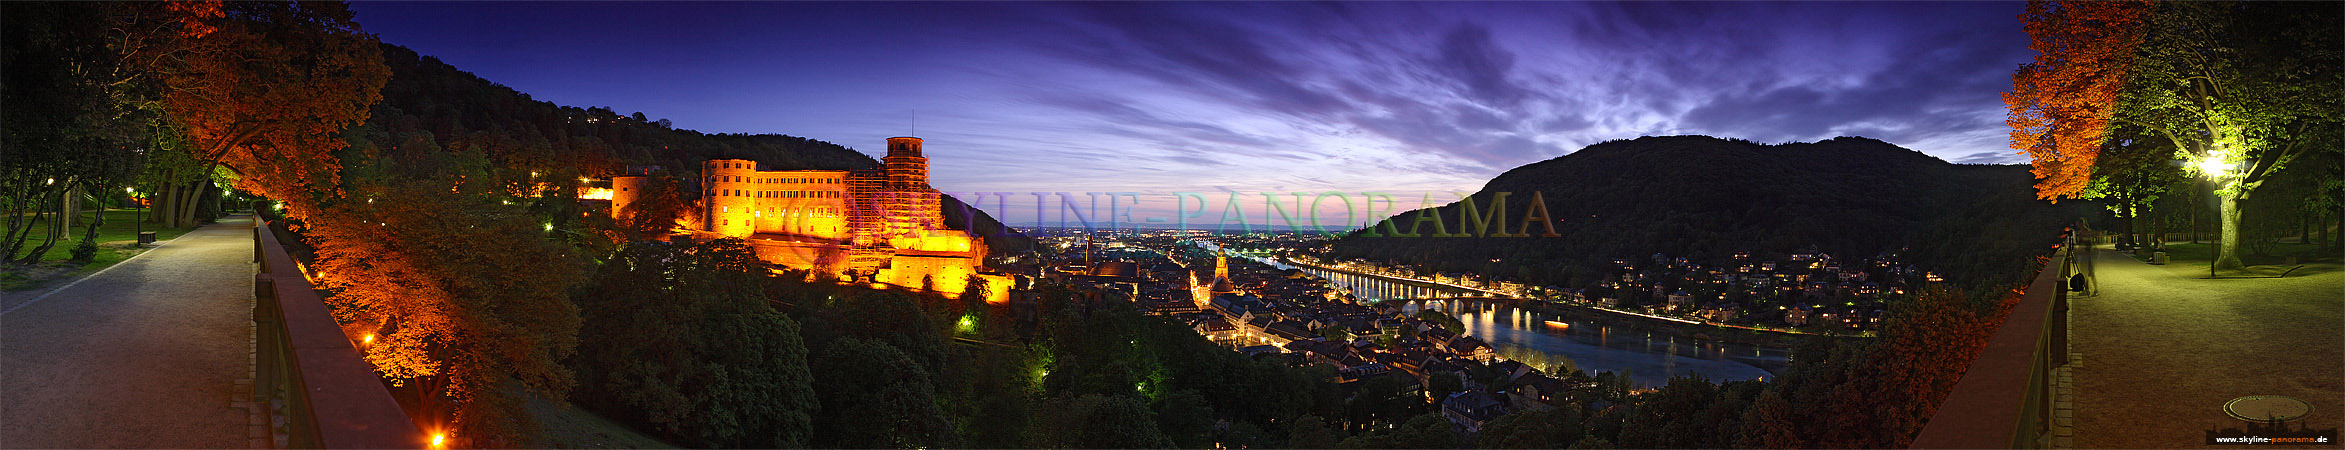 Altstadt mit Schlossblick - Panorama Bild in Richtung Heidelberger Schloss und der Heildelberger Altstadt am Abend aus dem Schlossgarten fotografiert.